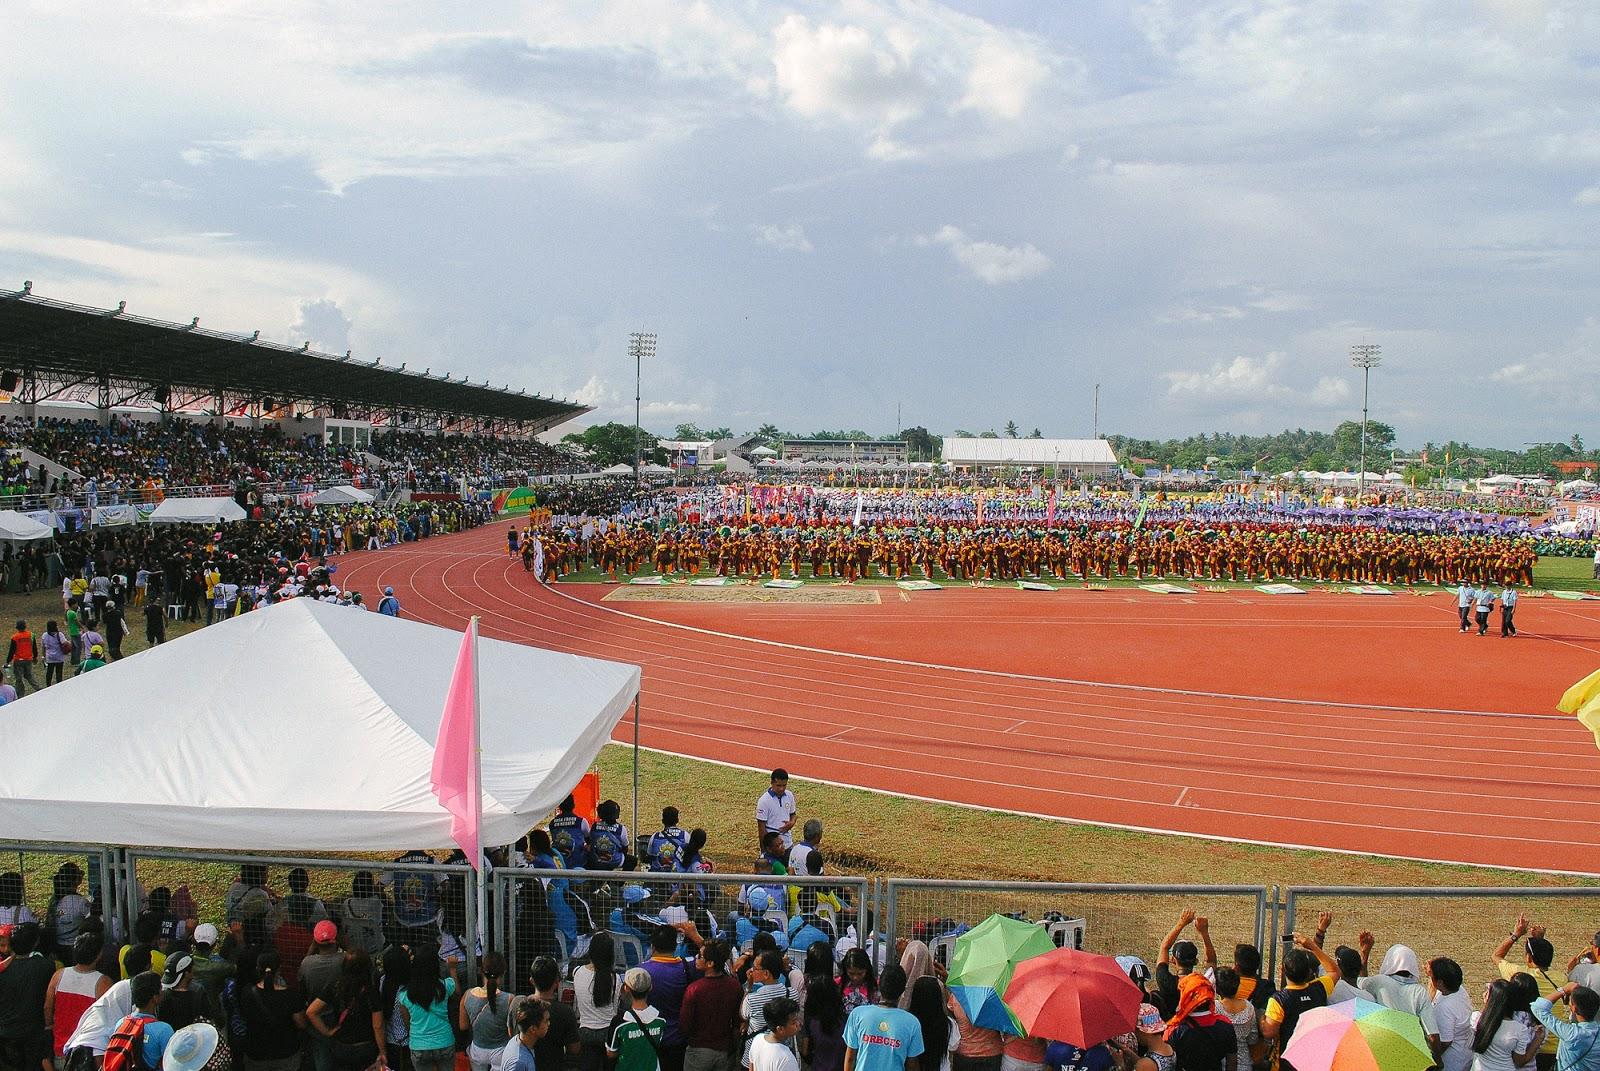 Davao City to Host the Southeast Asian Games in 2019 #SeaGames #DavaoRegion #DavaoCity